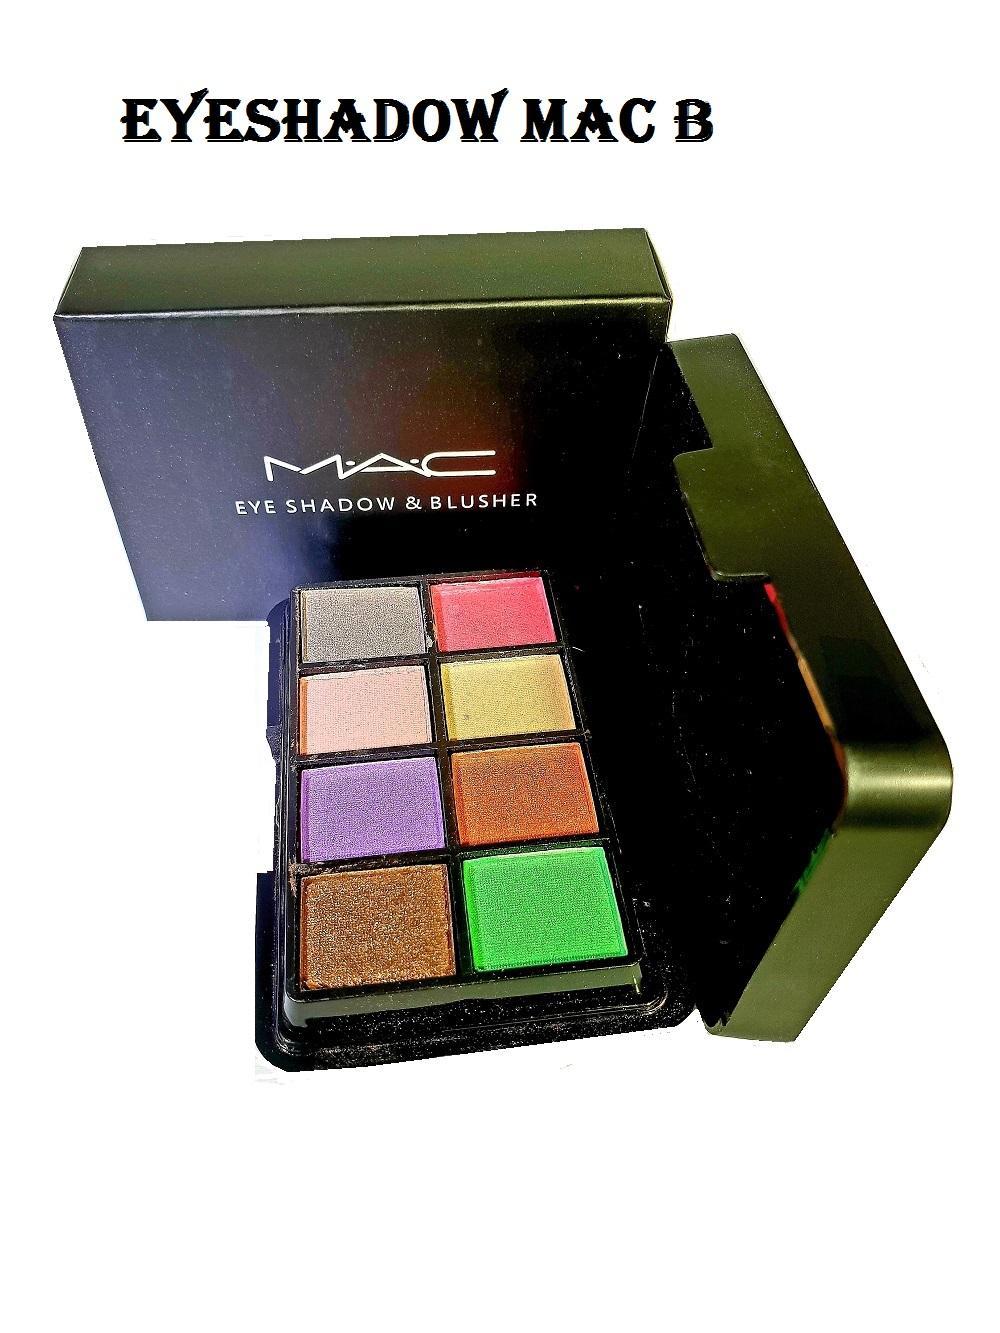 Berjaya Store - Make Up Palette Eyeshadow 8 Warna + Blusher / Blush On 2 Warna